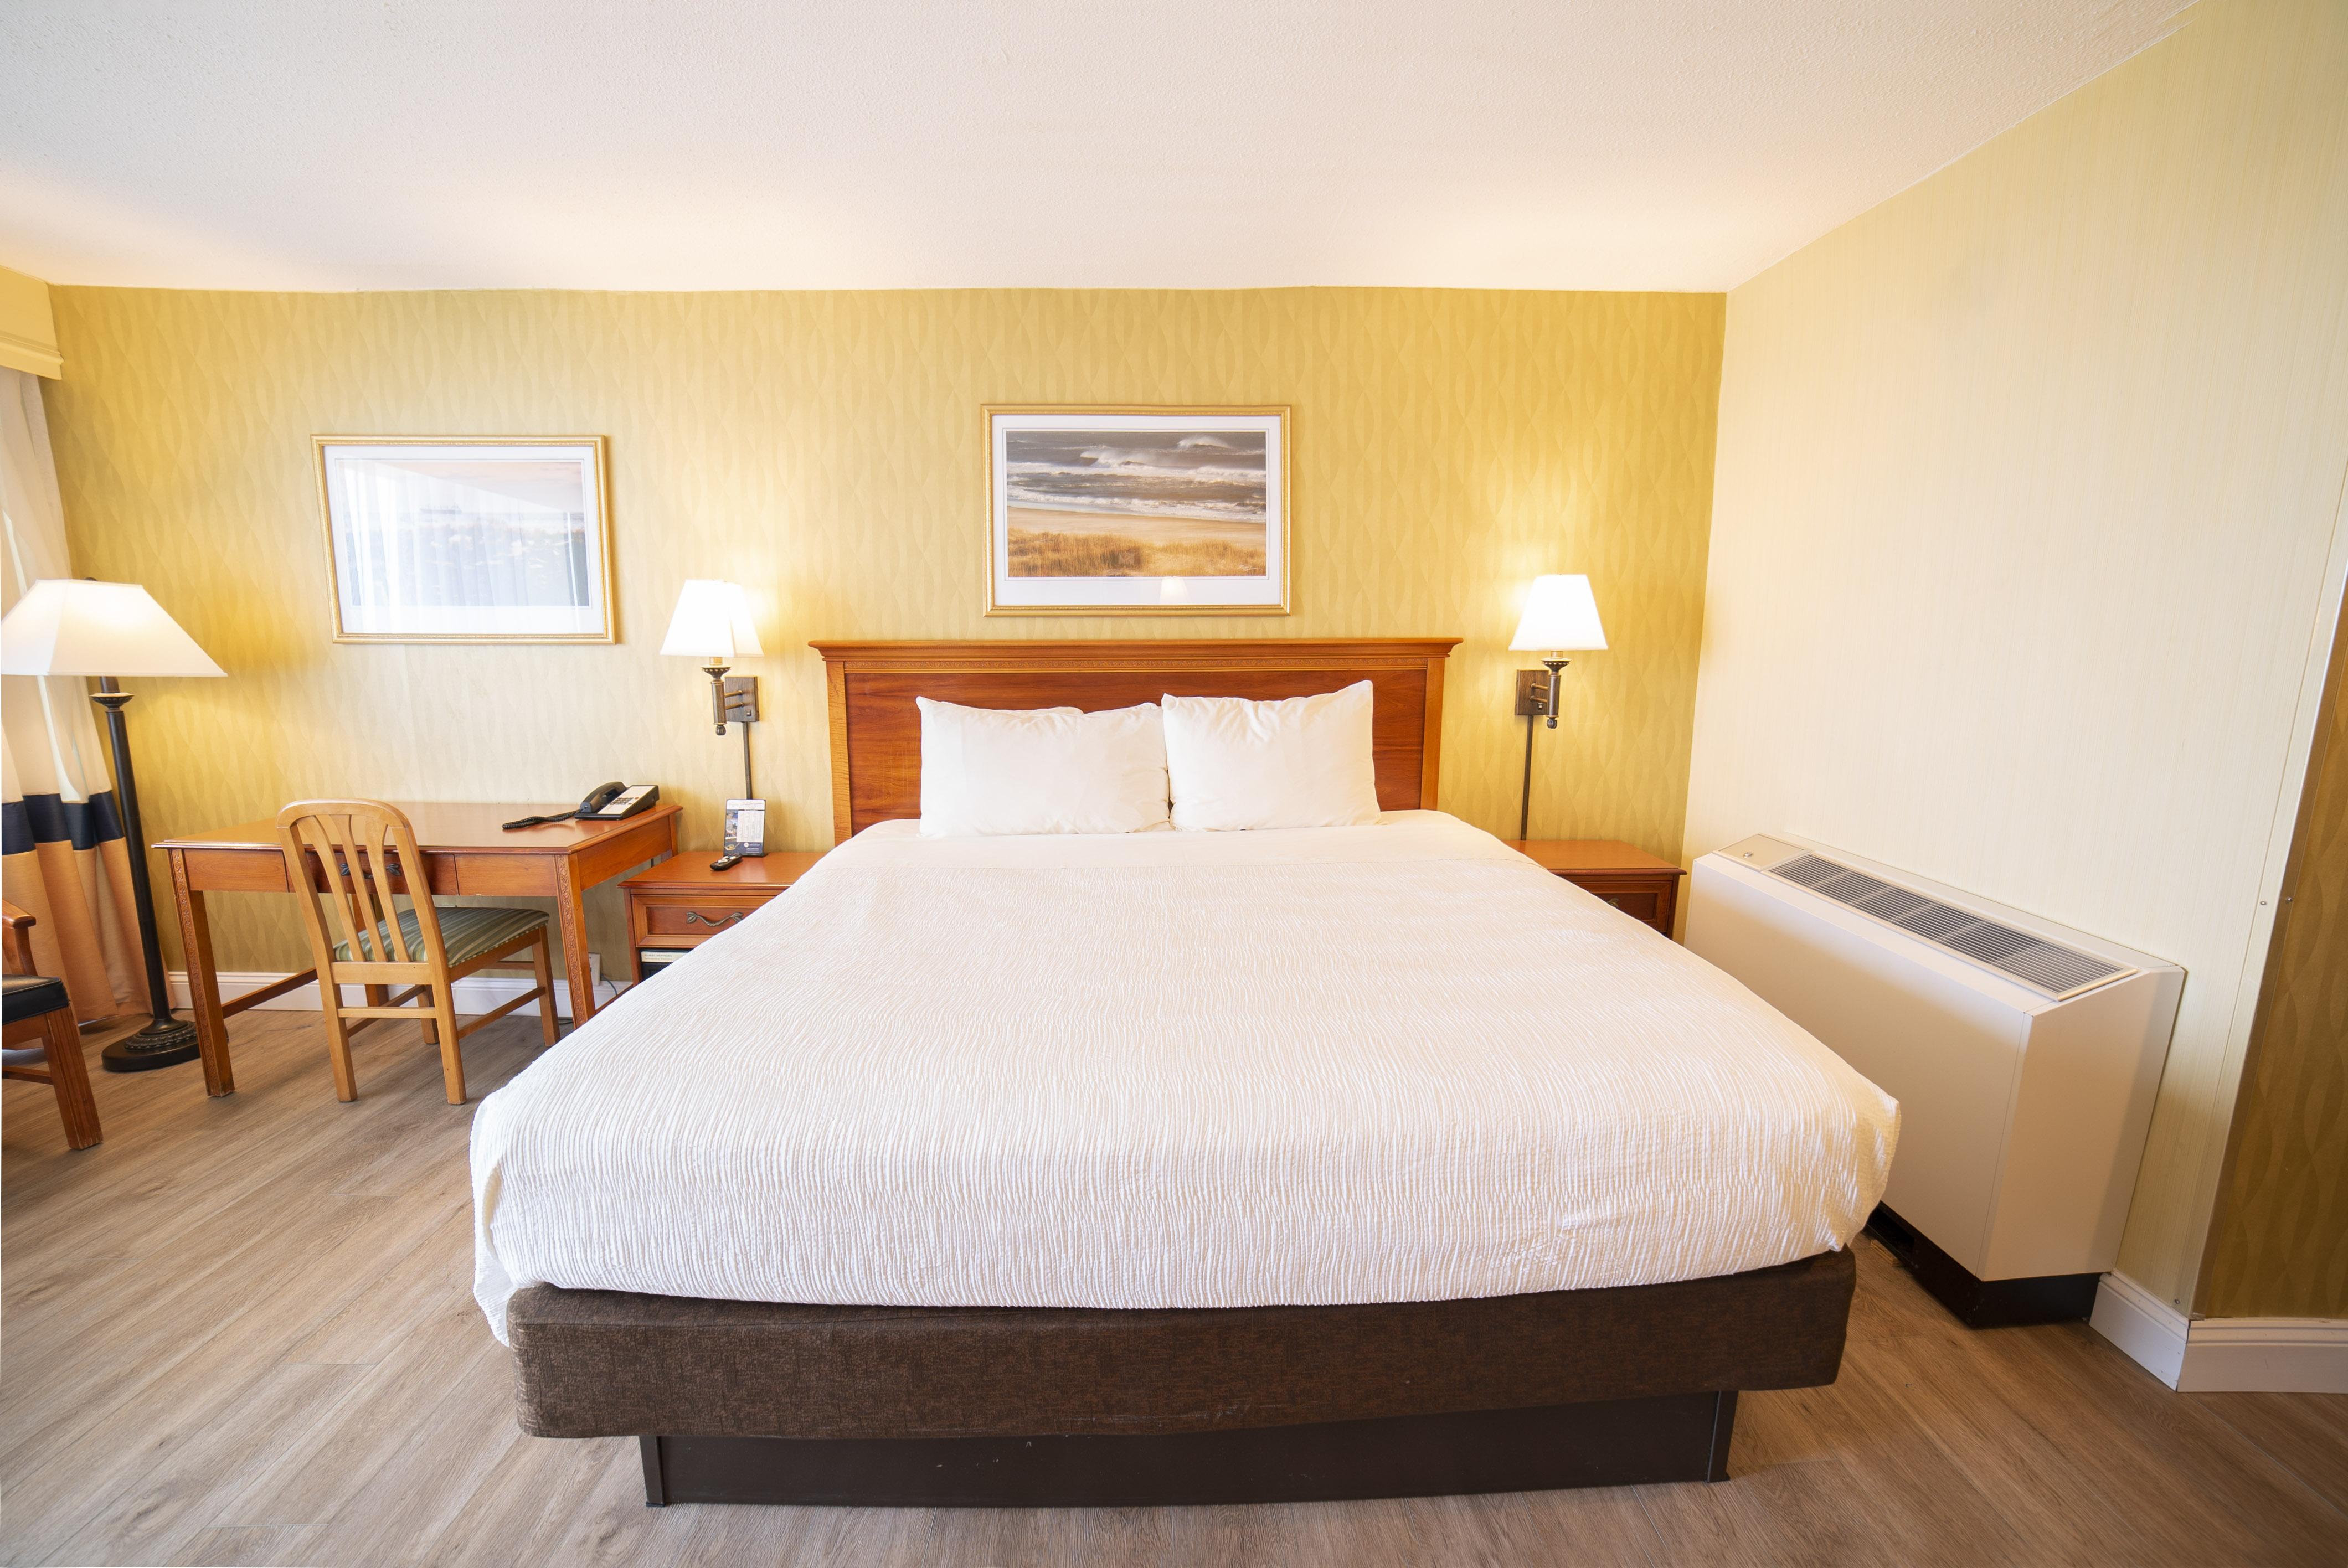 King Room Bedview 2020